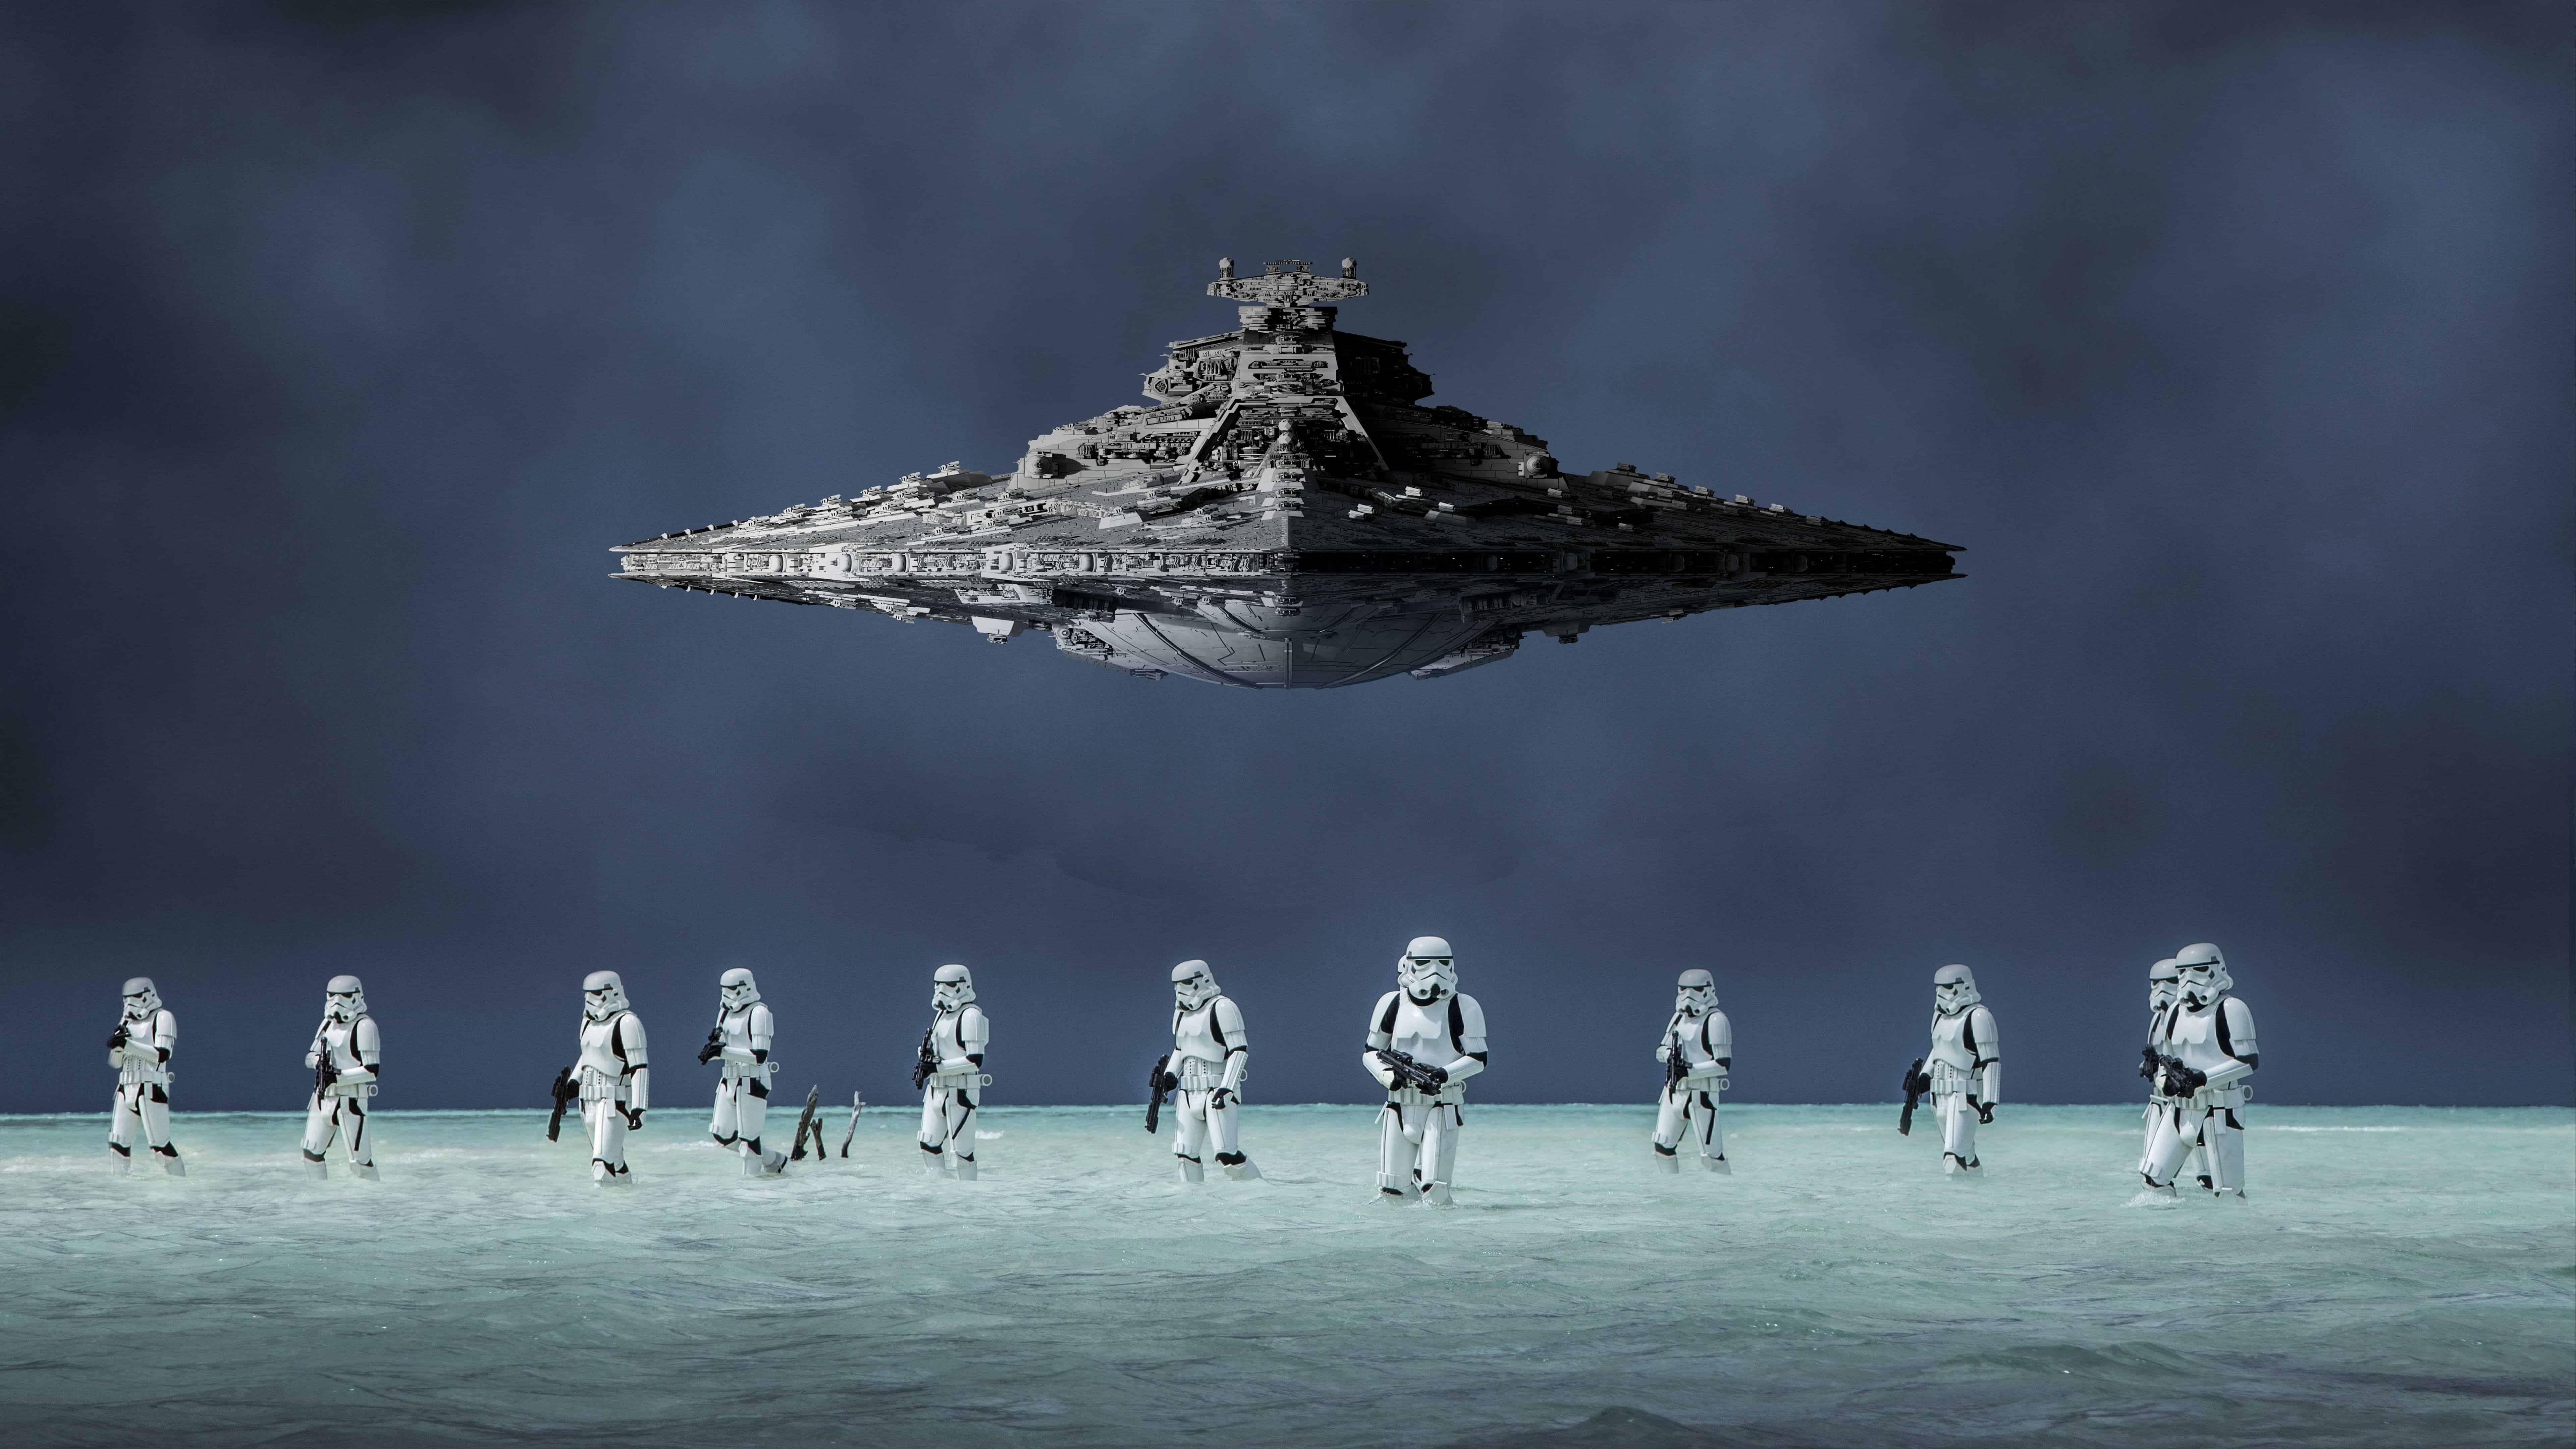 8k Star Wars Wallpapers Top Free 8k Star Wars Backgrounds Wallpaperaccess